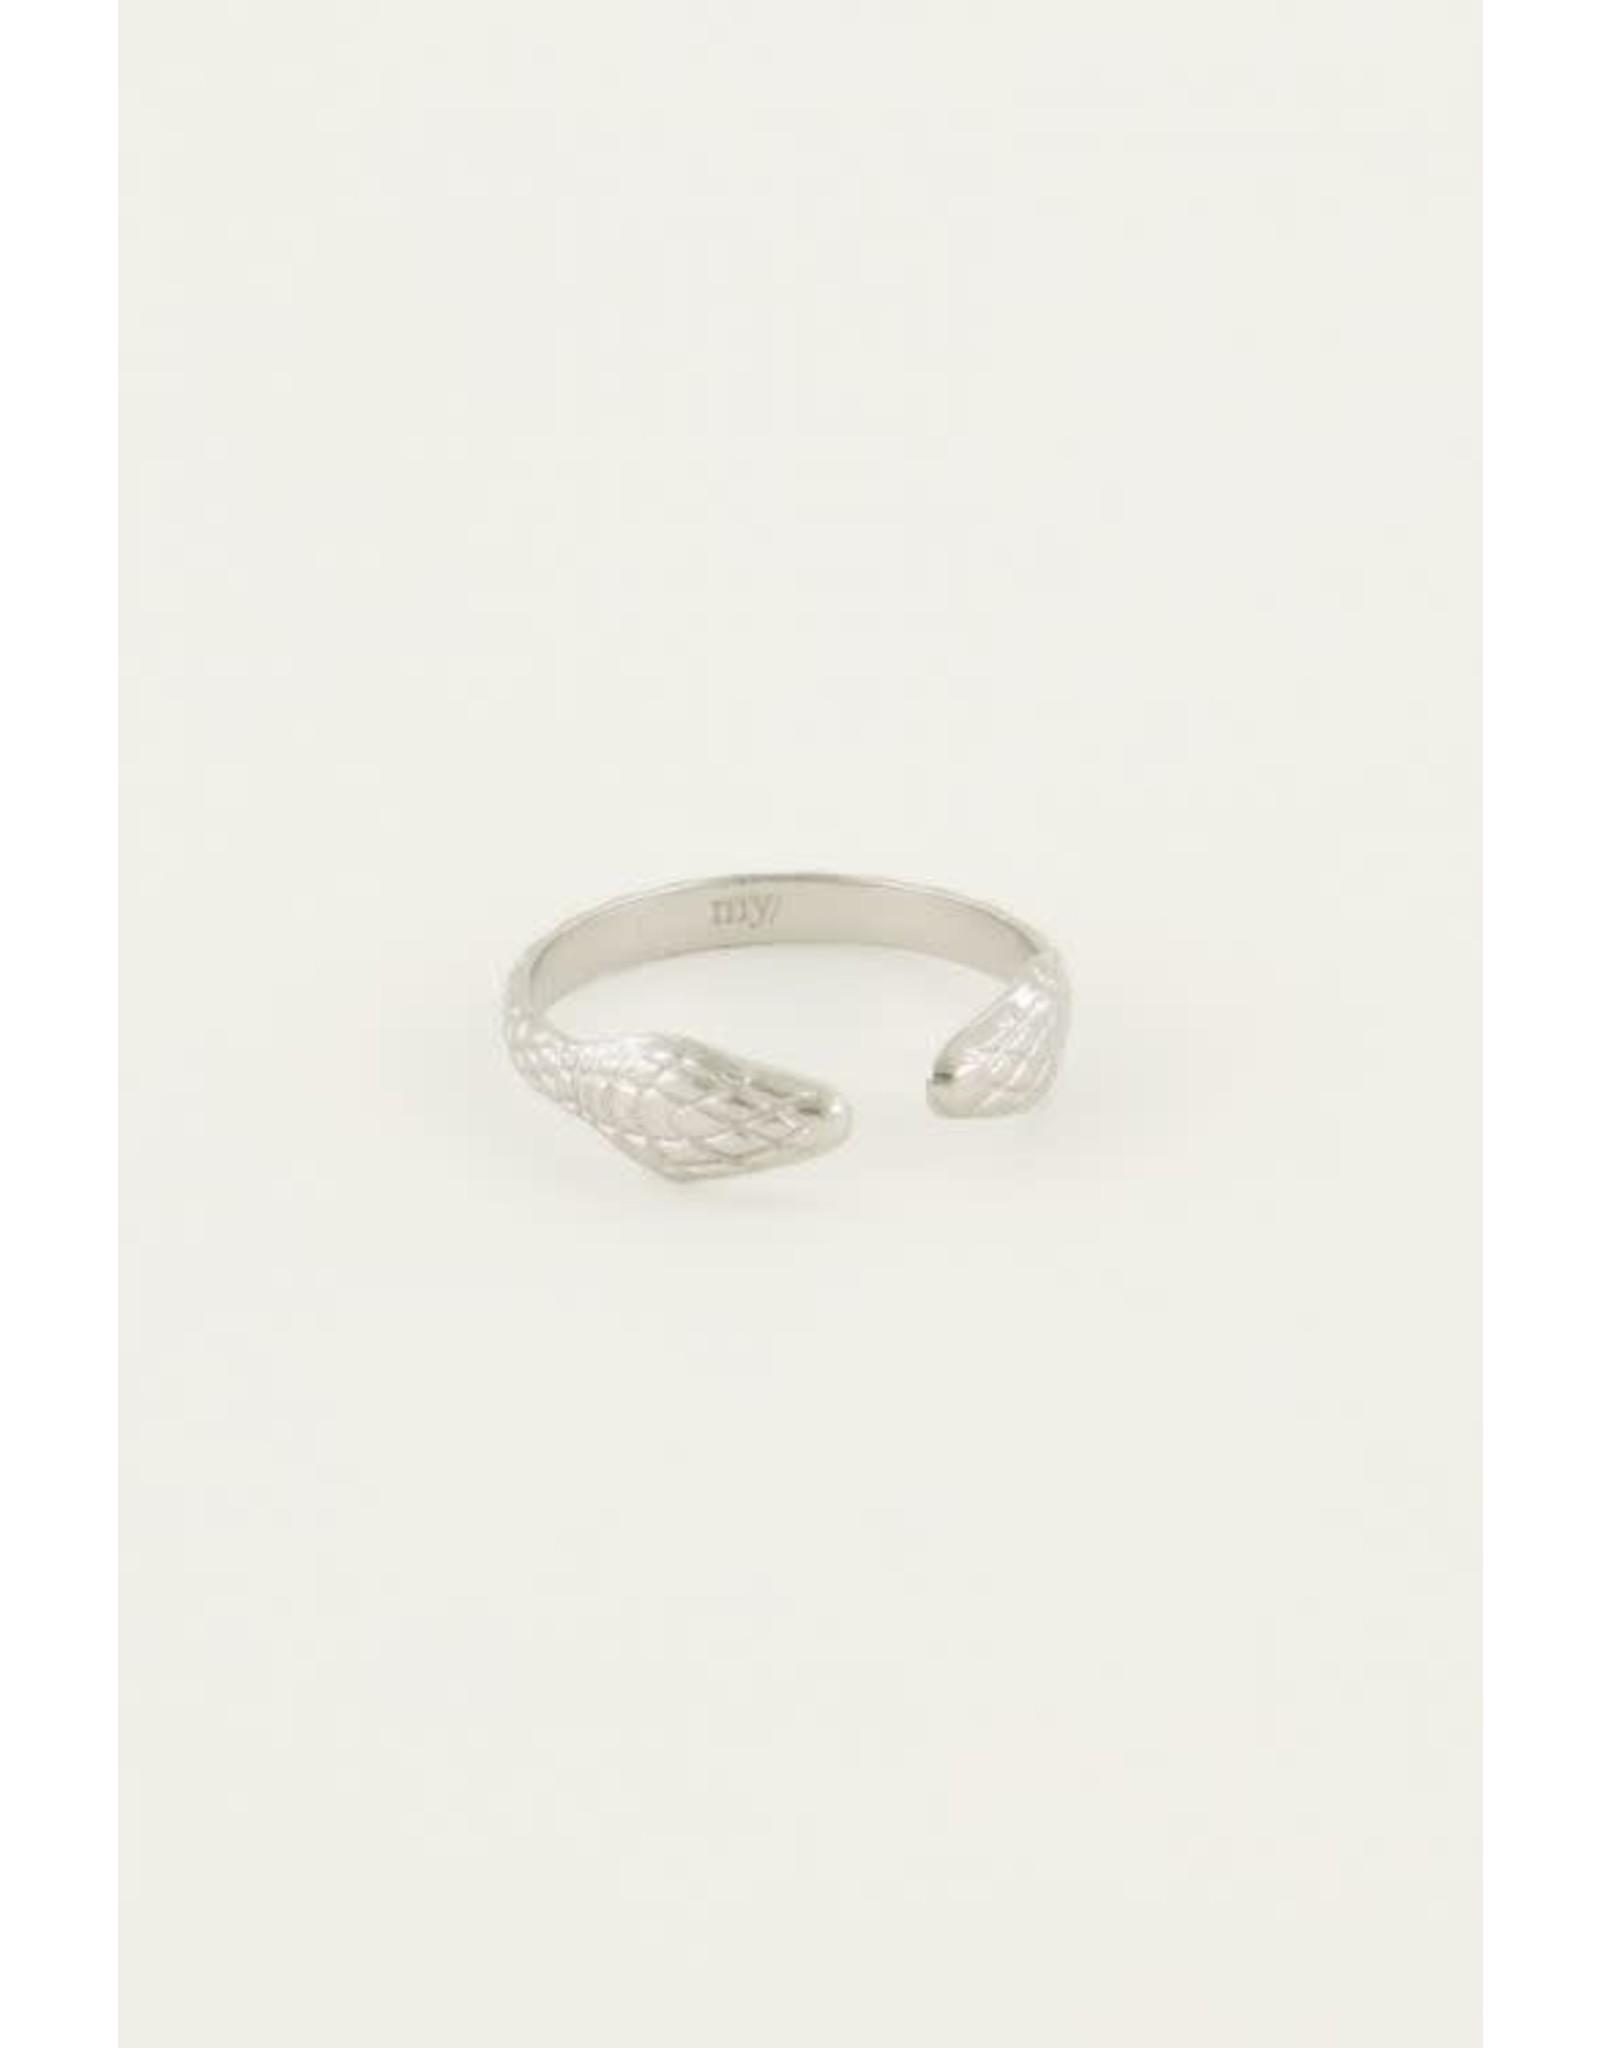 My Jewellery My Jewellery ring slang